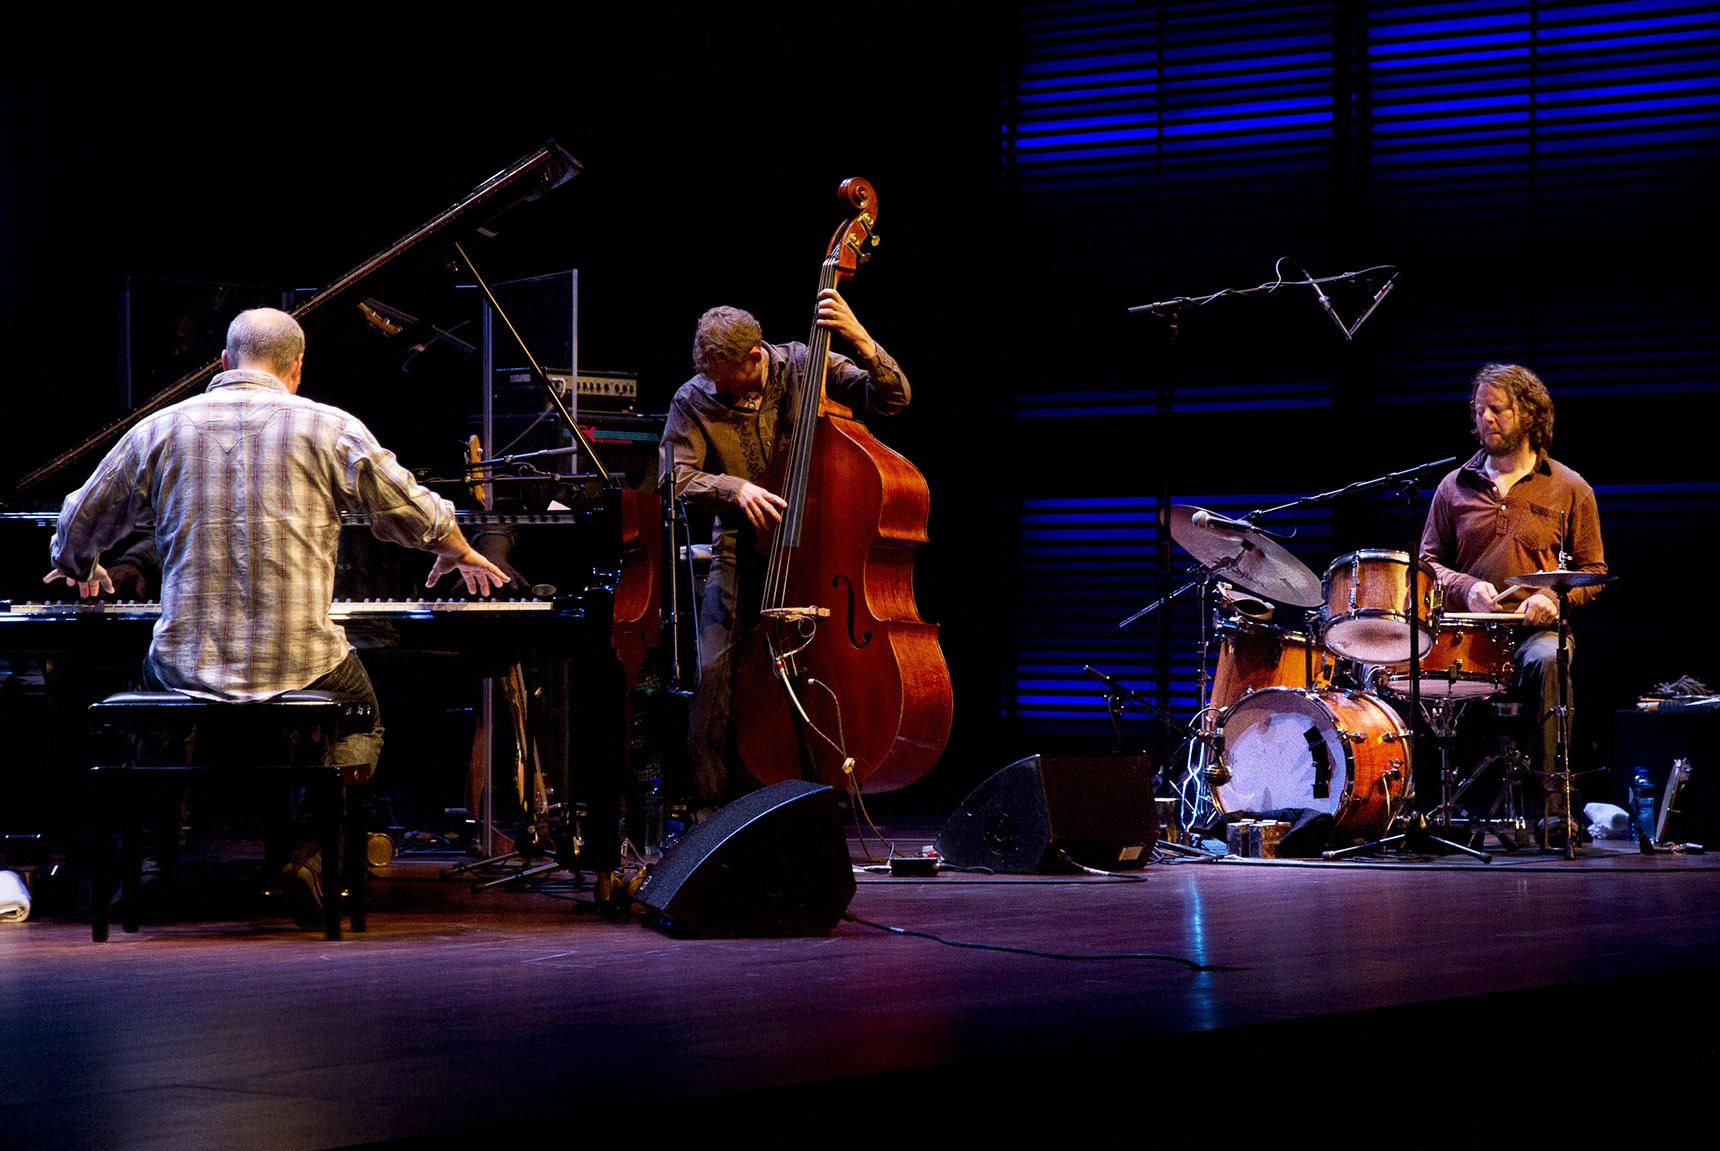 Medeski, Martin & Wood - Unplugged in Amsterdam